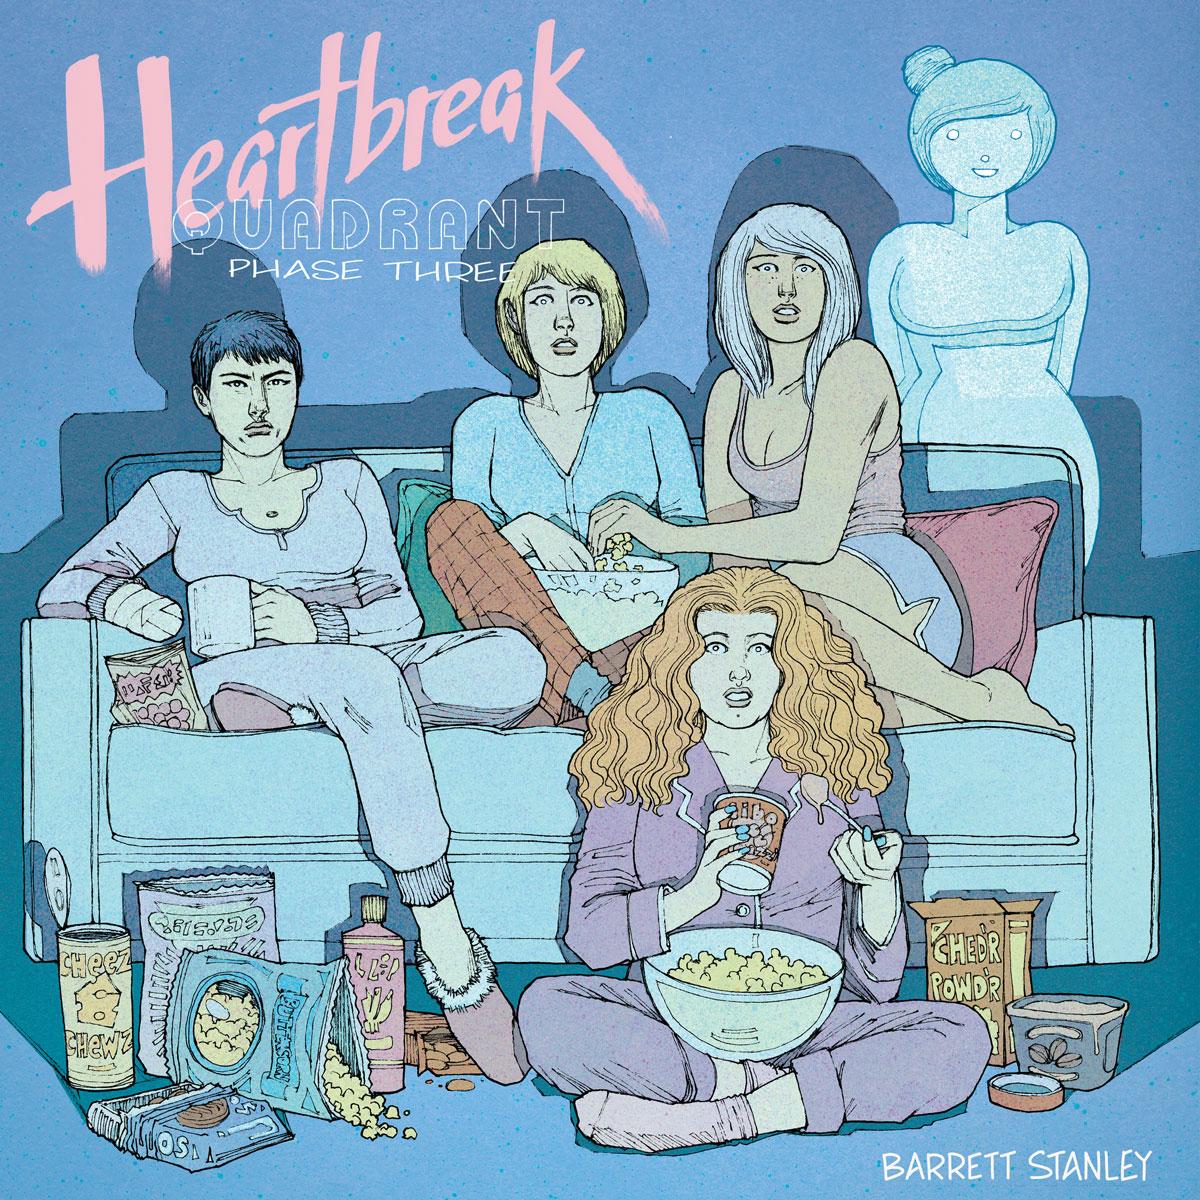 Heartbreak Quadrant Phase 3 by Barrett Stanley